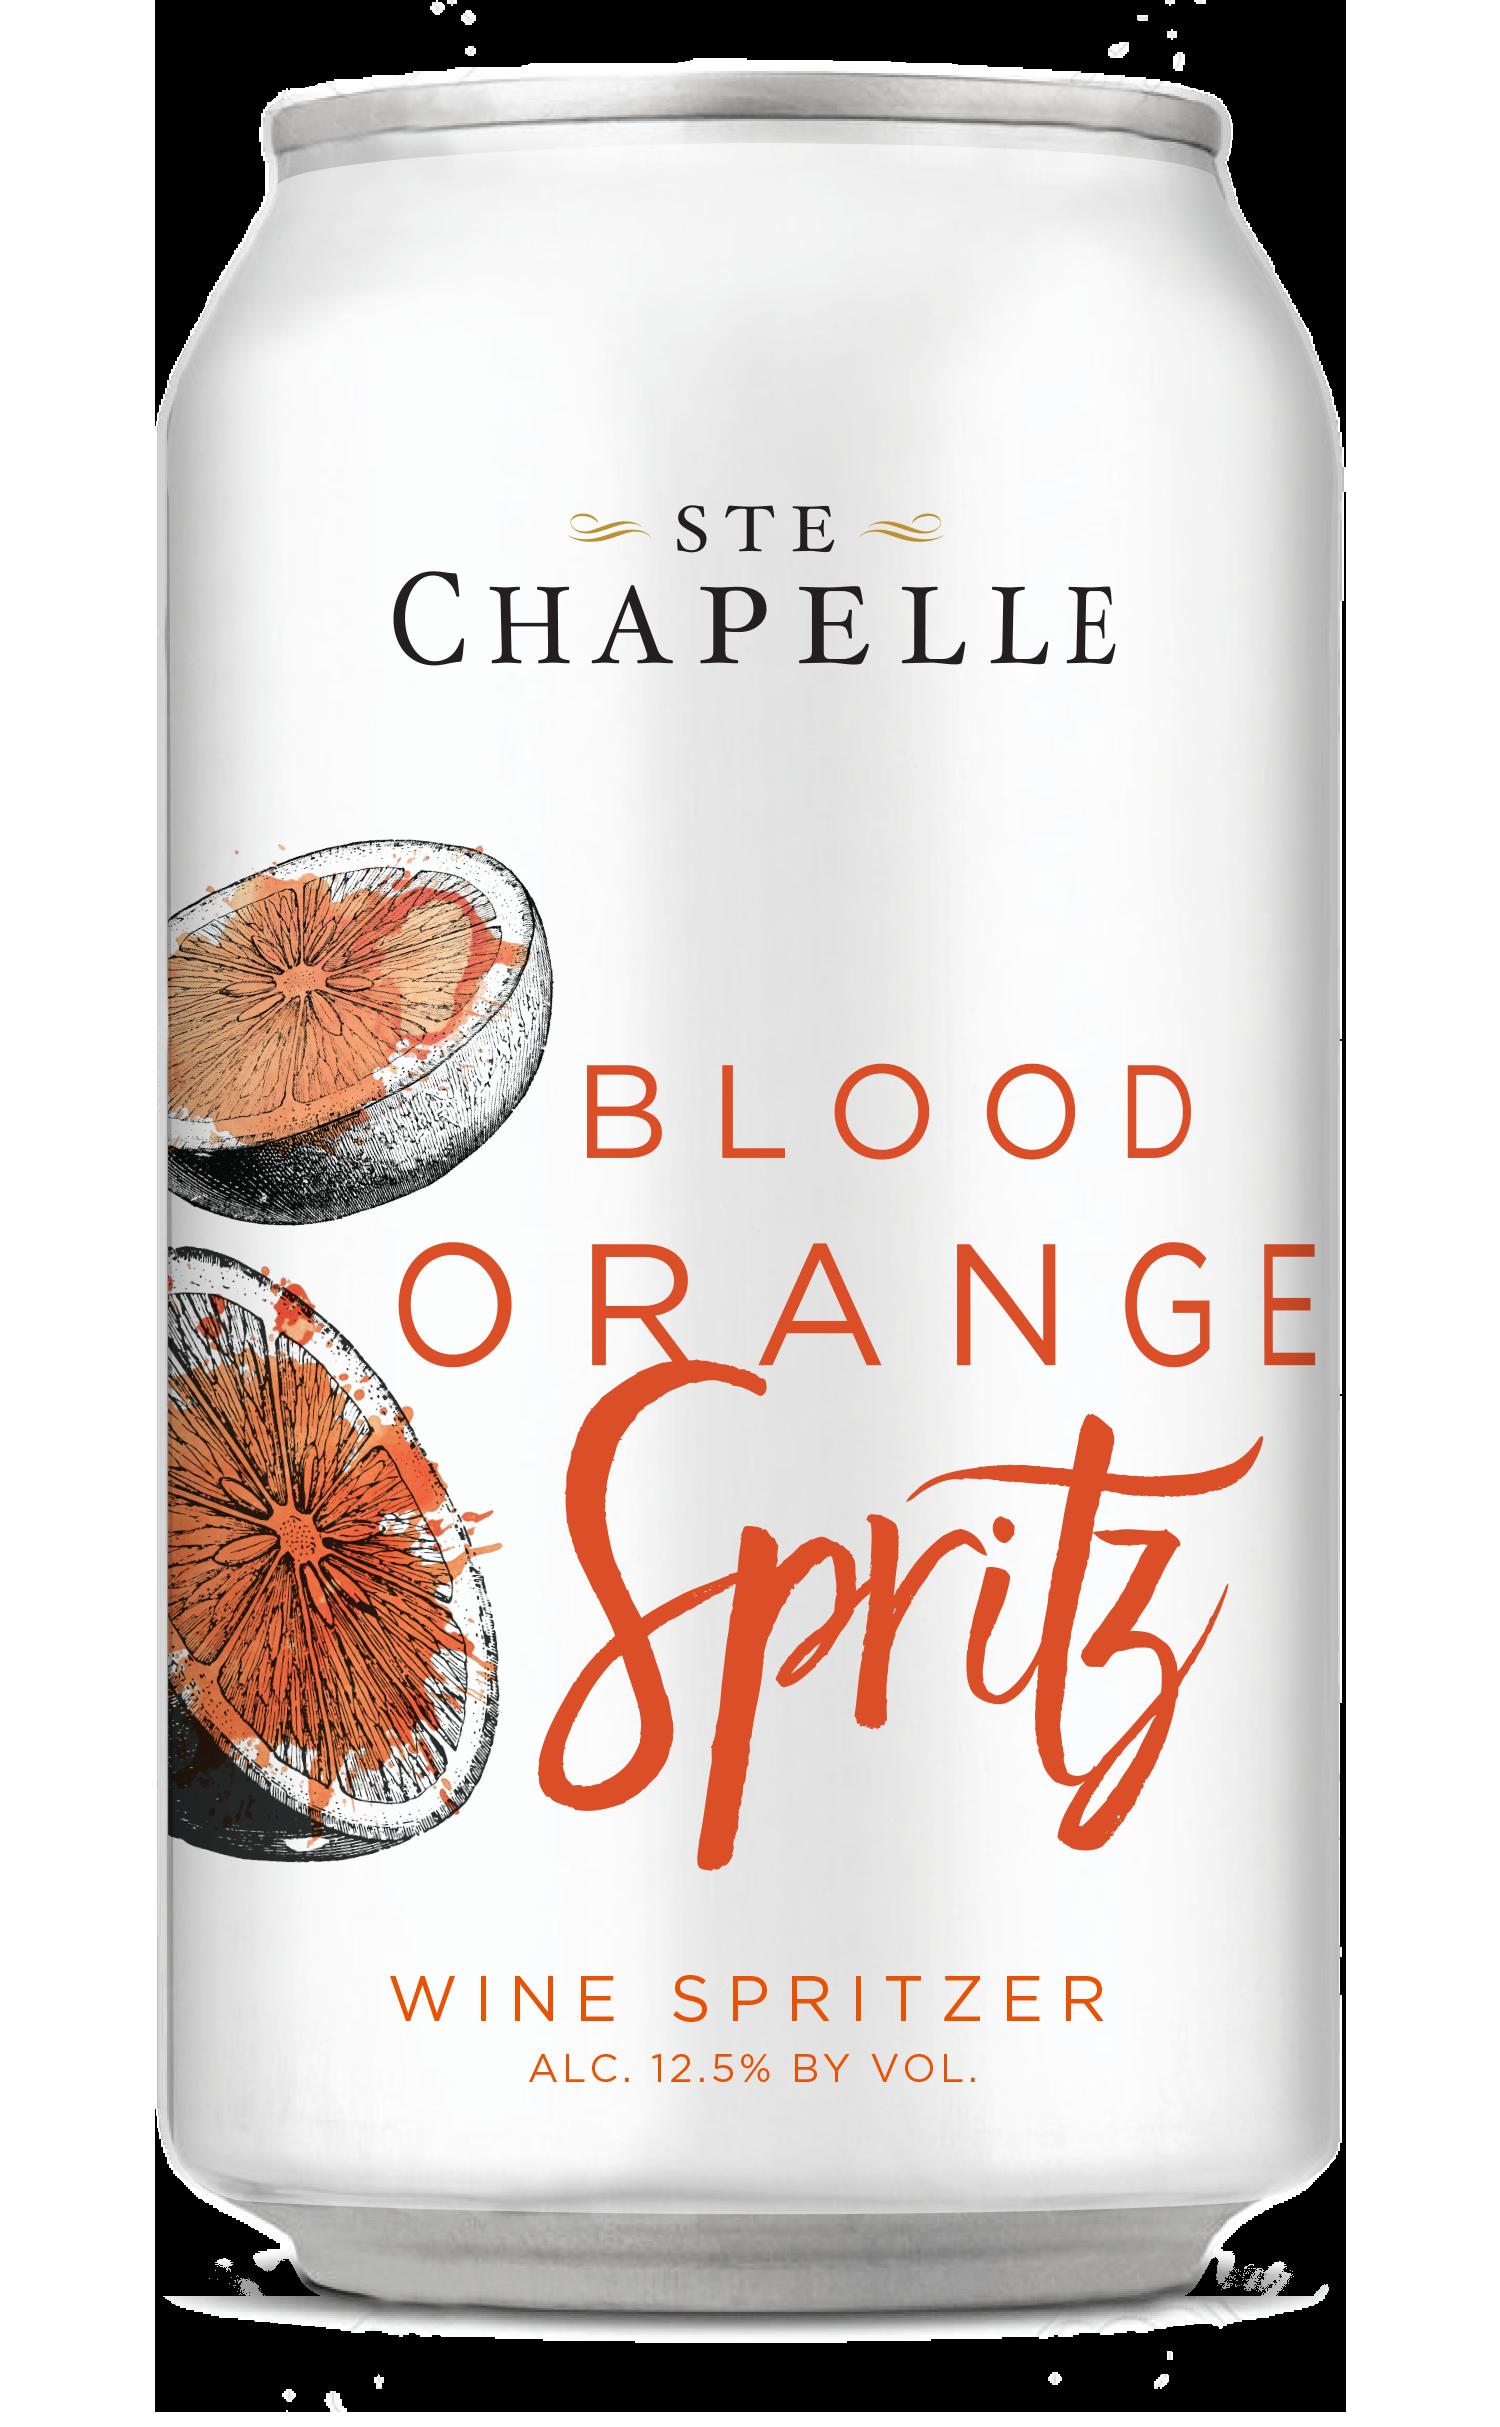 Precept Wine 187 Our Wines 187 Ste Chapelle 187 Blood Orange